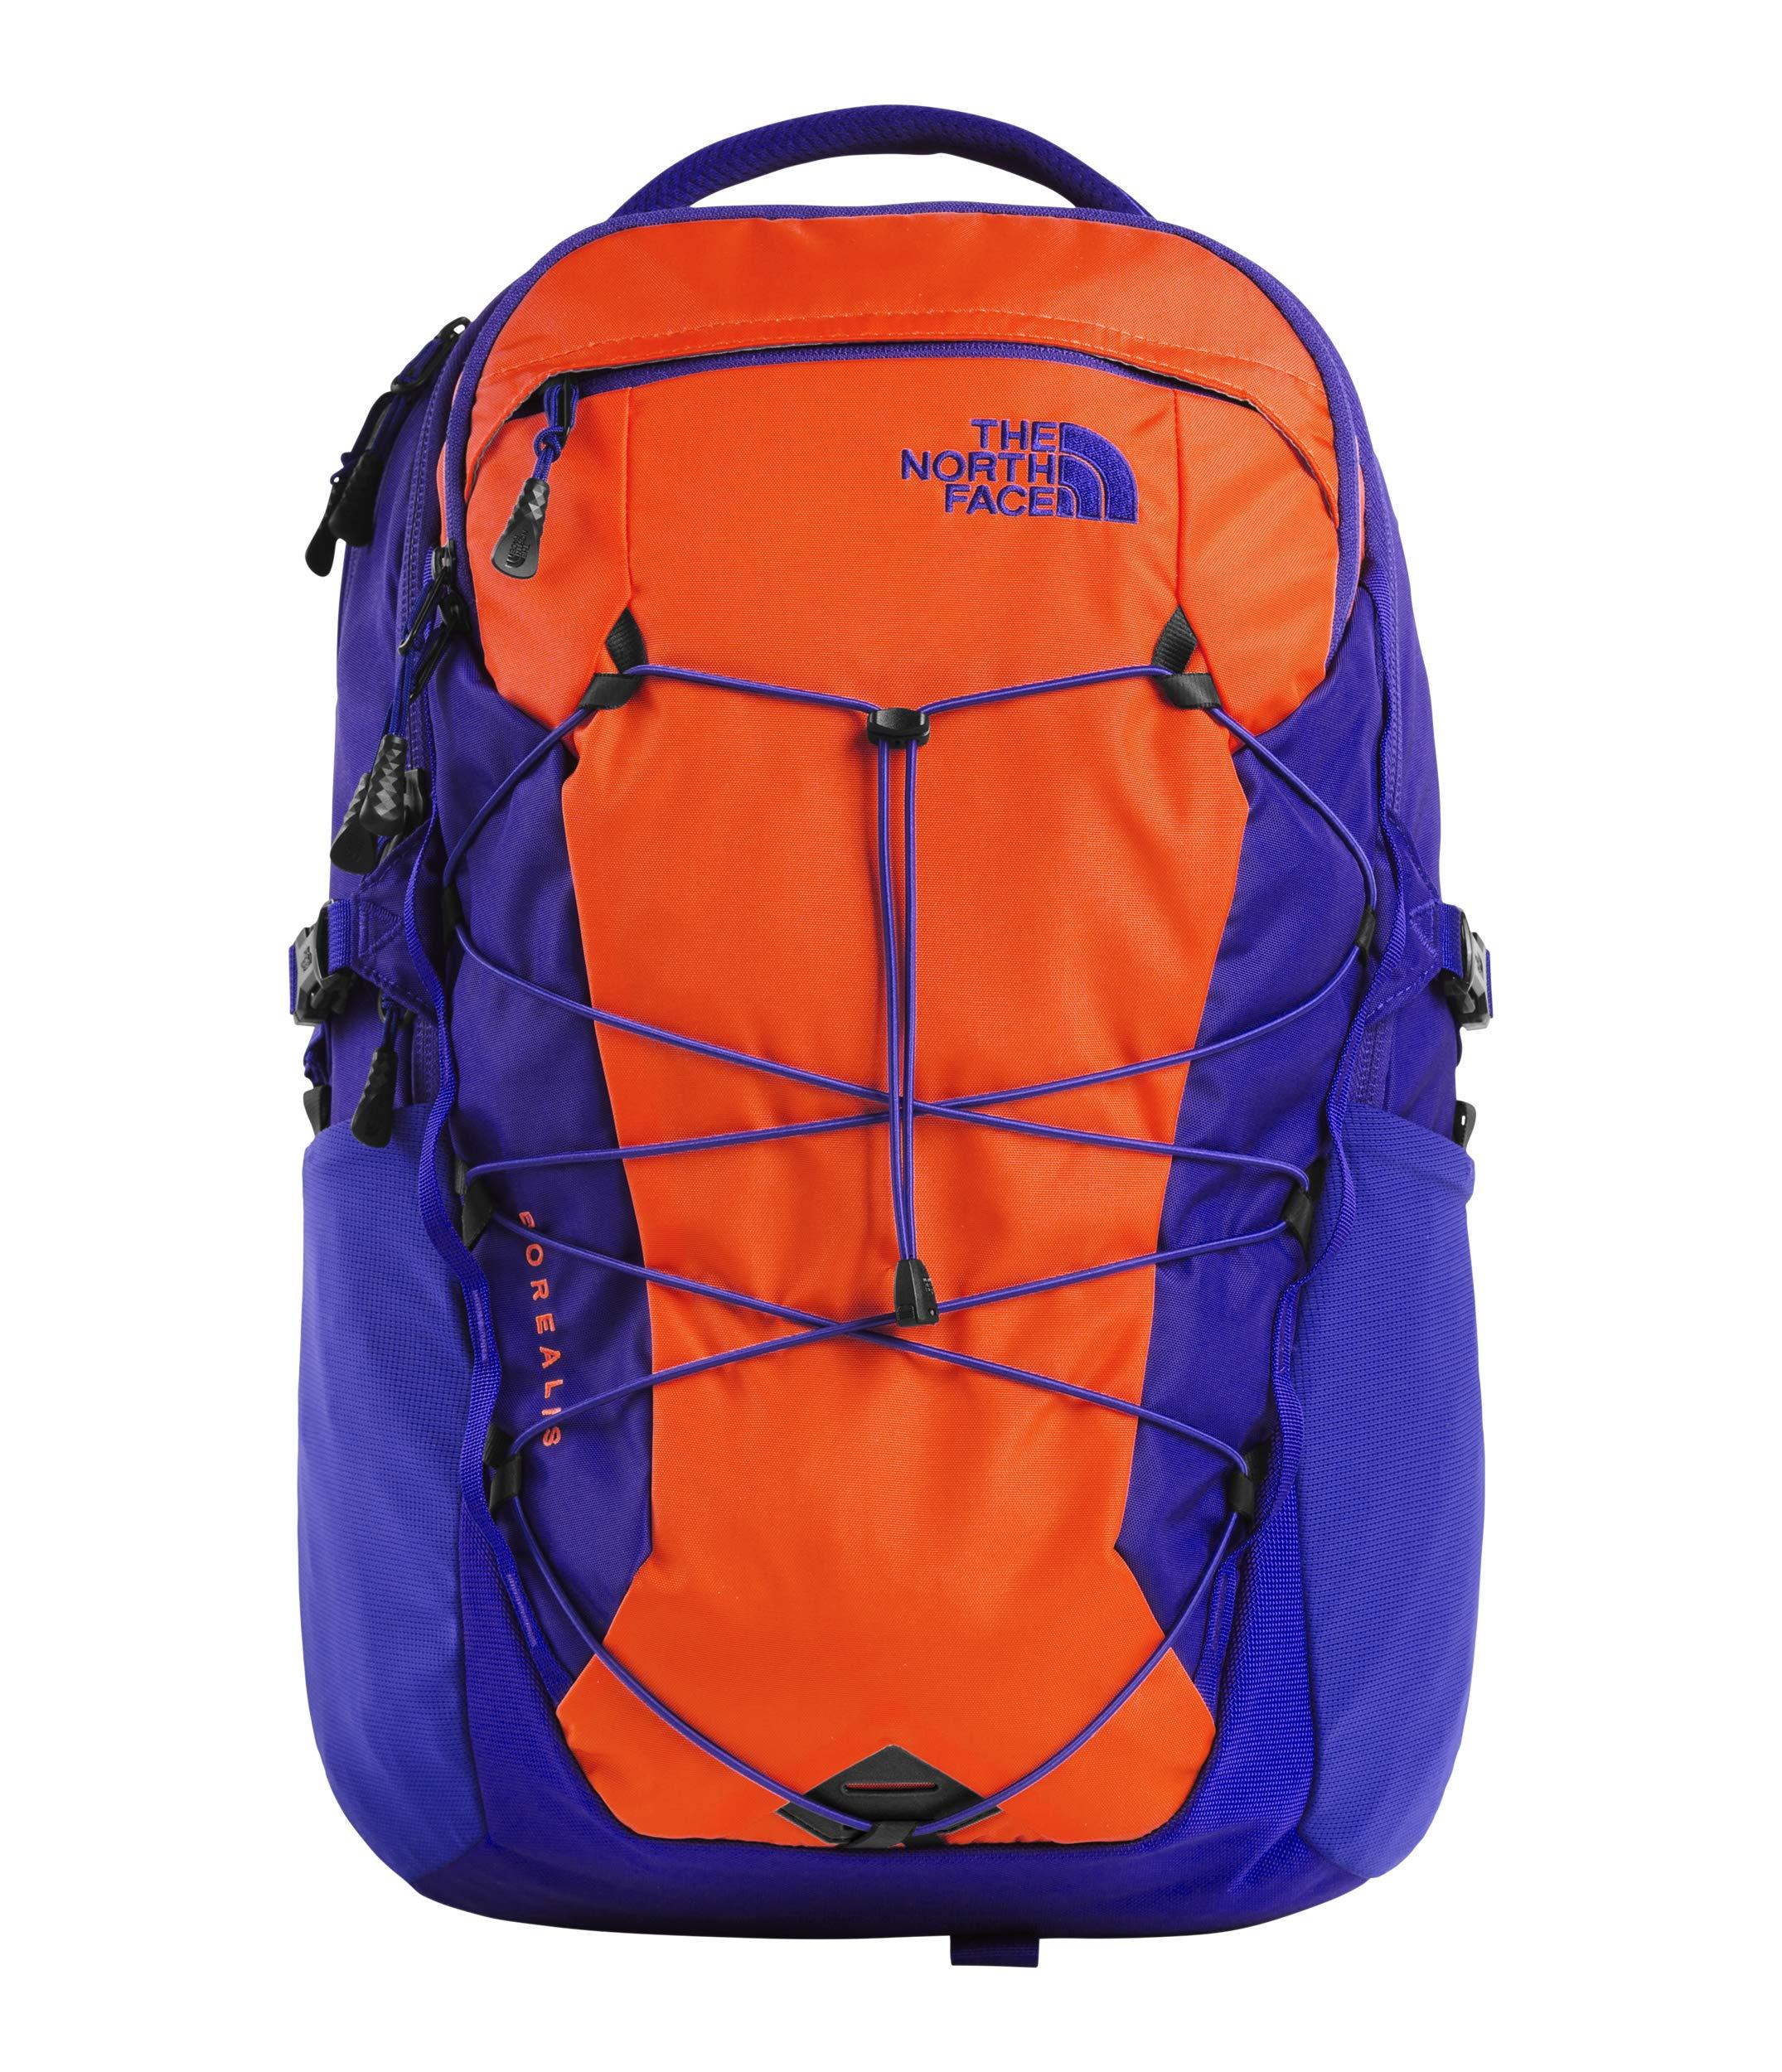 The North Face Borealis, Persian Orange/Aztec Blue, OS